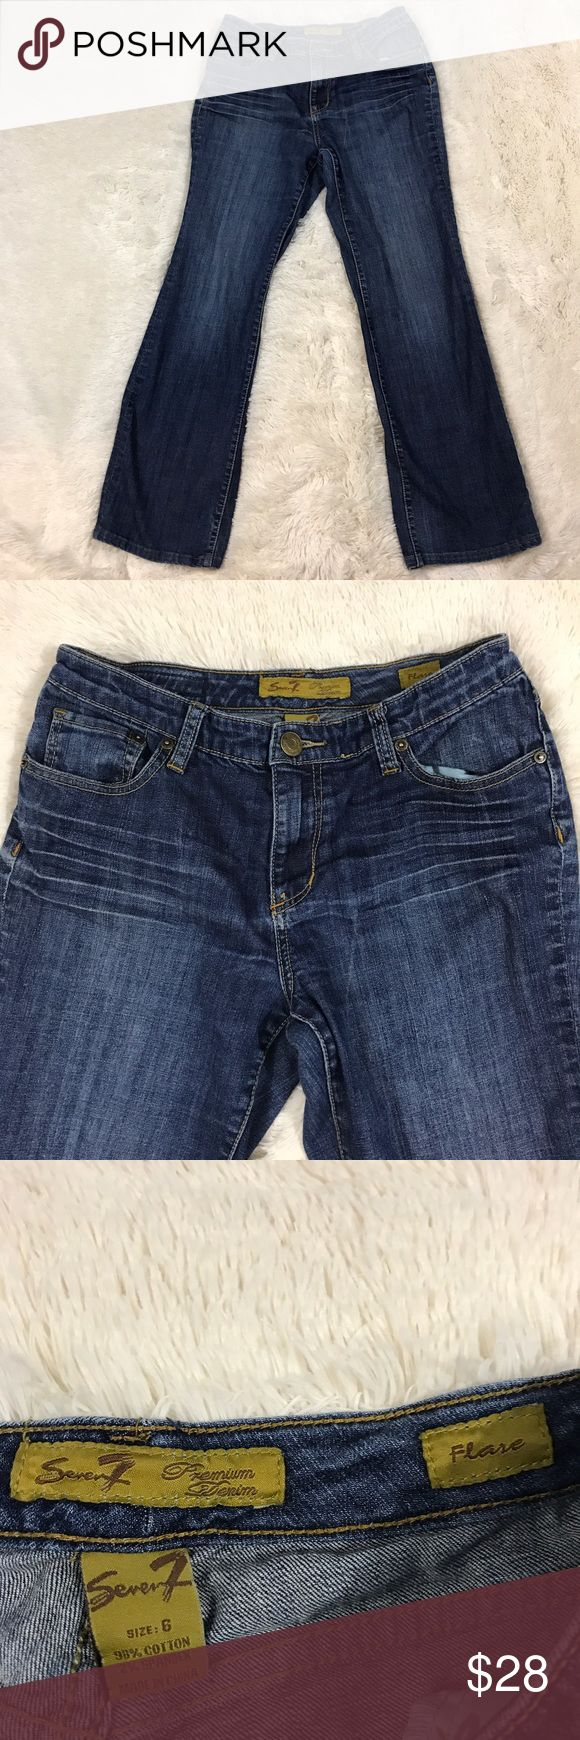 Seven7 Flare Jeans Size 6 Women's size 6 dark wash Seven7 flare jeans. 98% cotton, 2% spandex. Seven7 Jeans Flare & Wide Leg